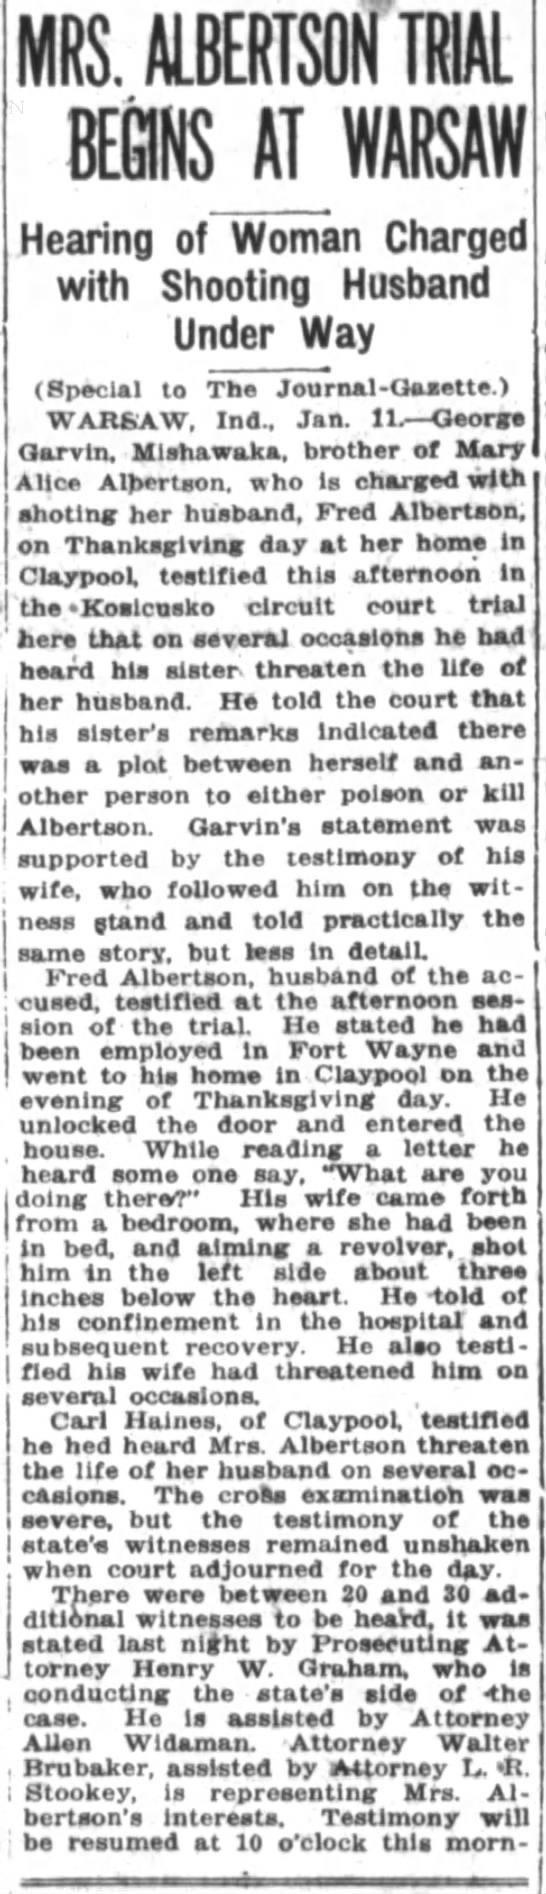 Albertson Shooting - MRS. ALBERTSQN TRIAL AT Hearing of Woman...